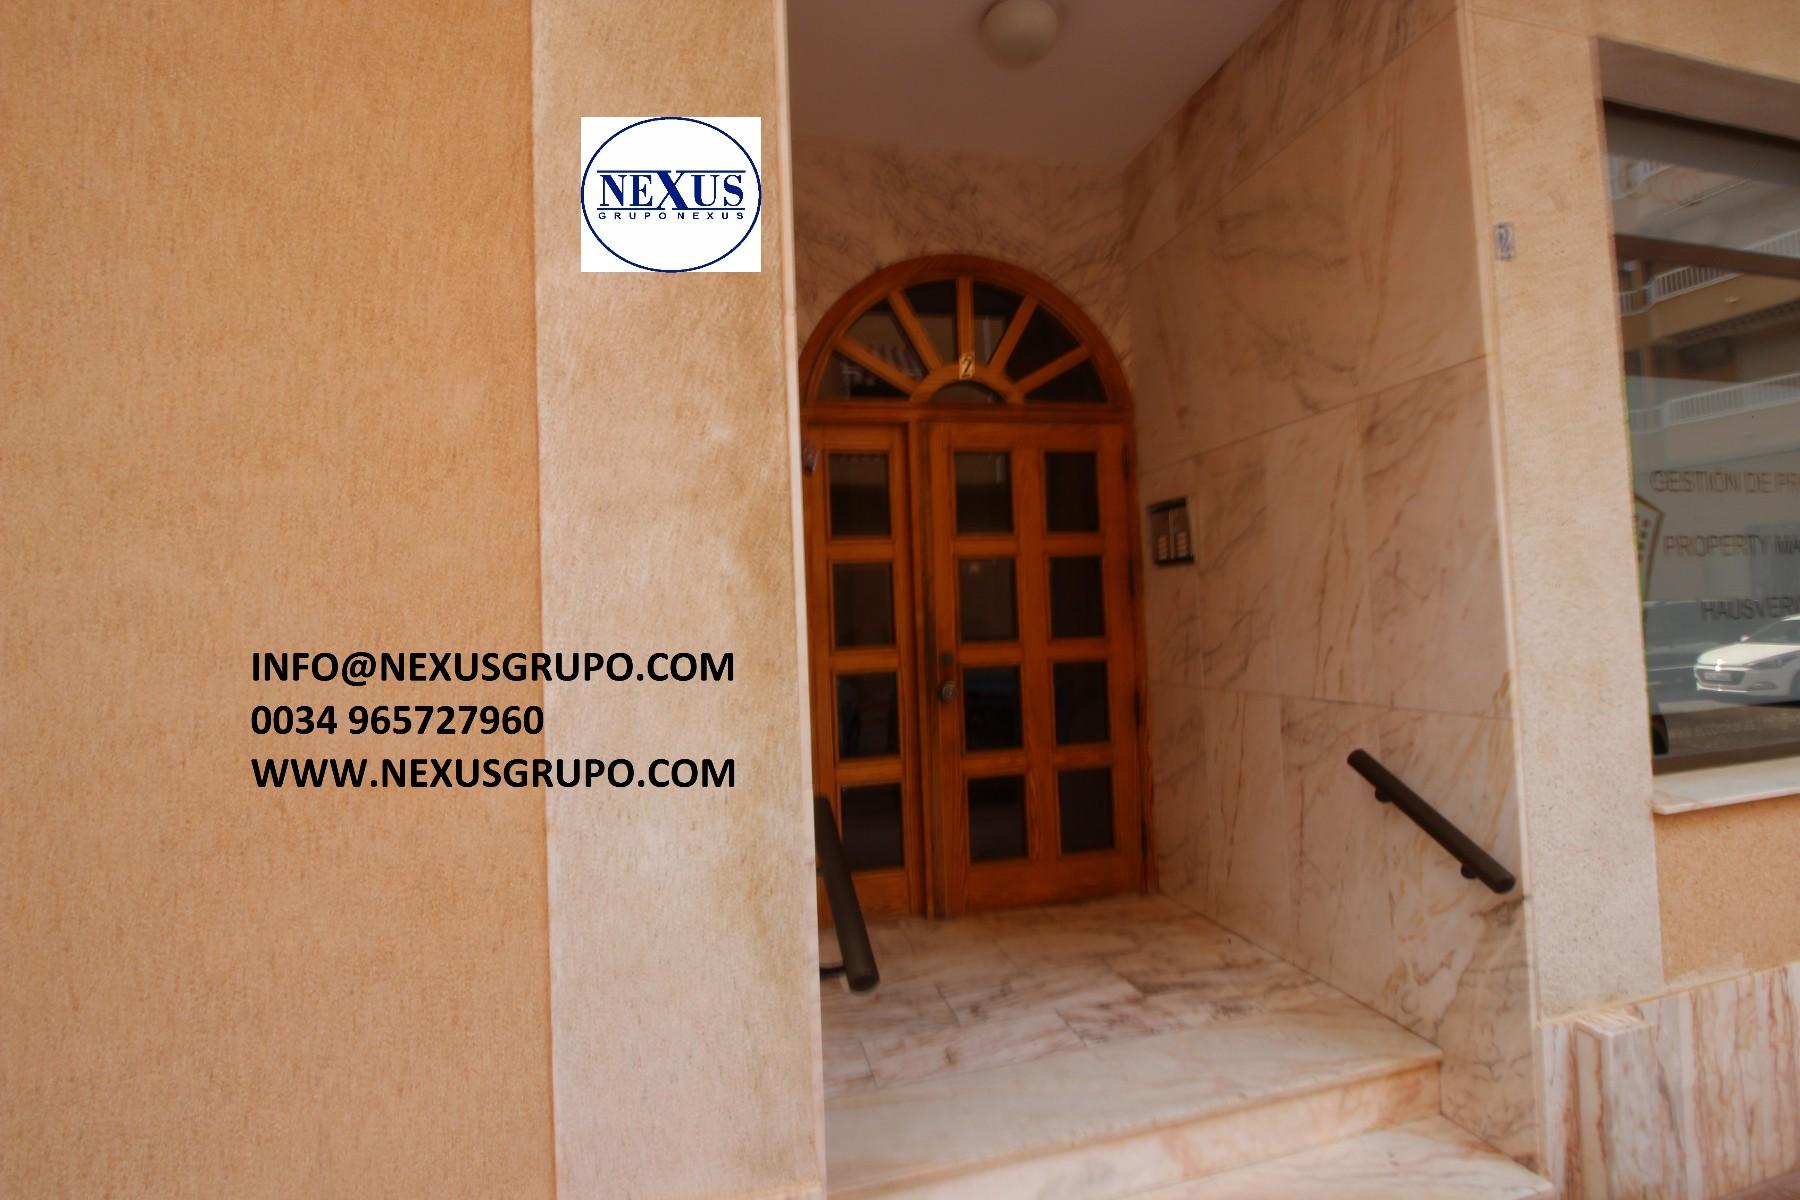 Real Estate Group Nexus sells an excellent apartment near Mercadona. in Nexus Grupo